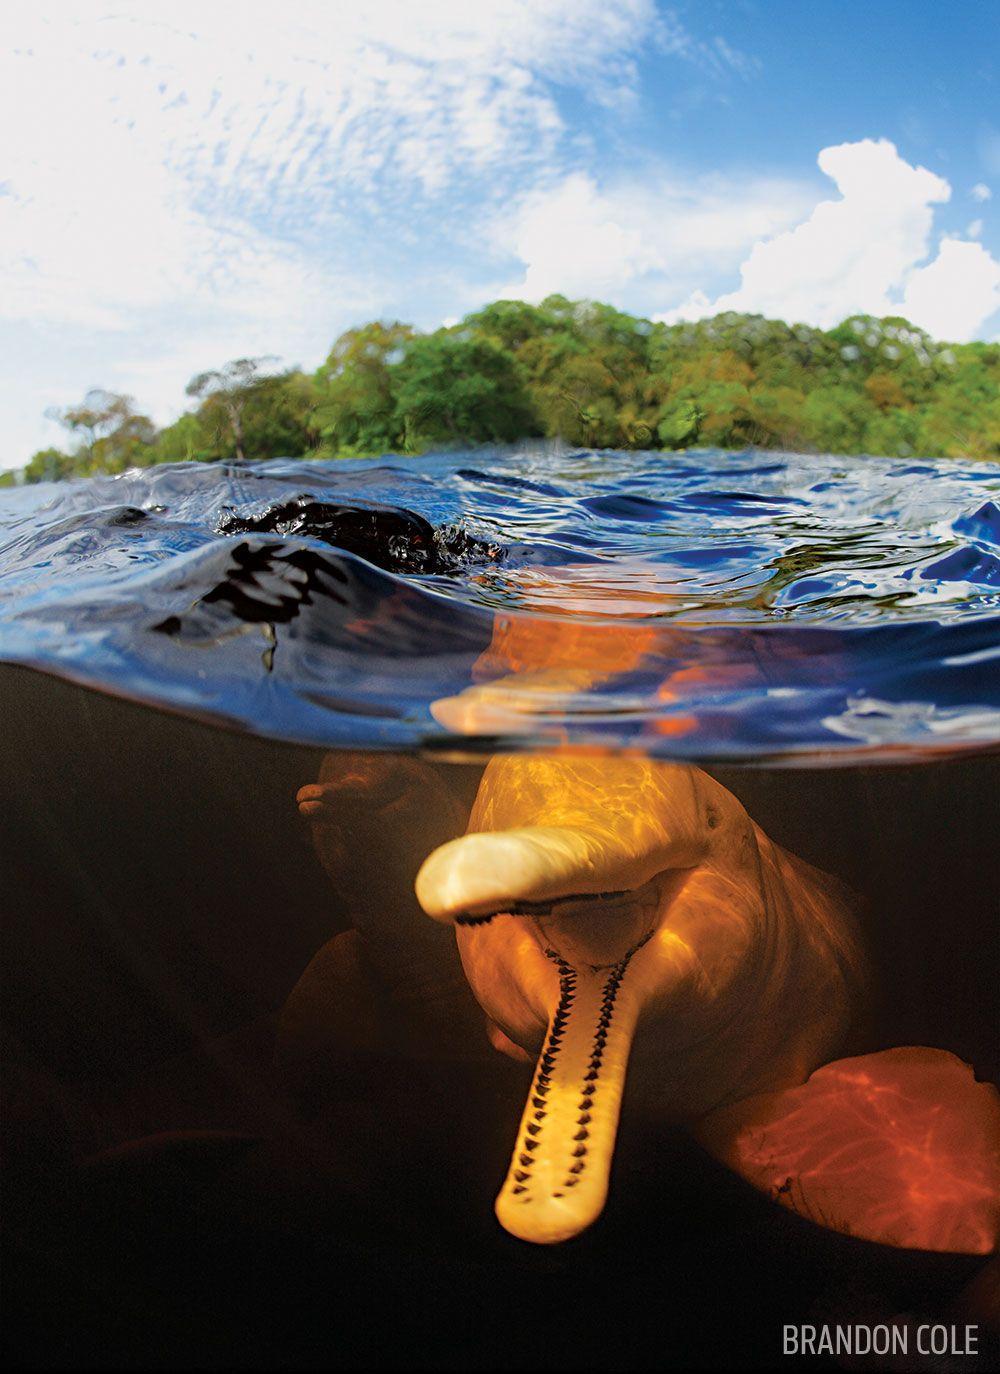 15 Insane Underwater Photos Of The Deadliest Animals In Brazil